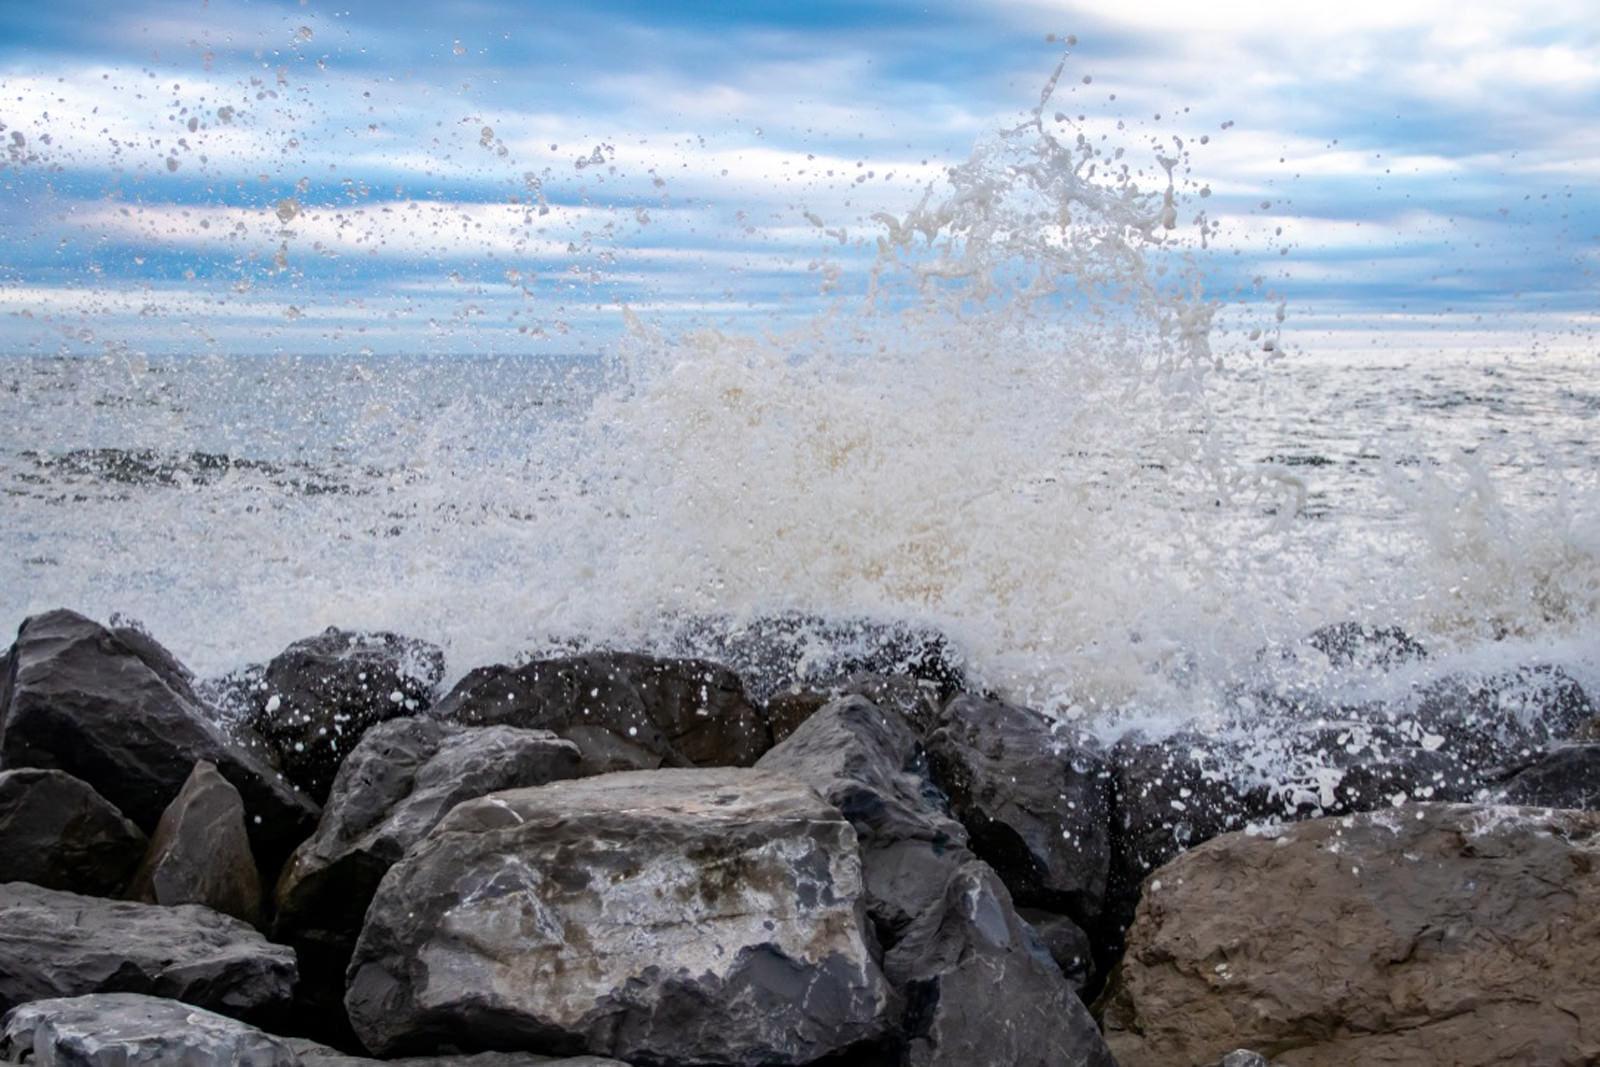 Waves crashing on jetty at Dauphin Island, AL